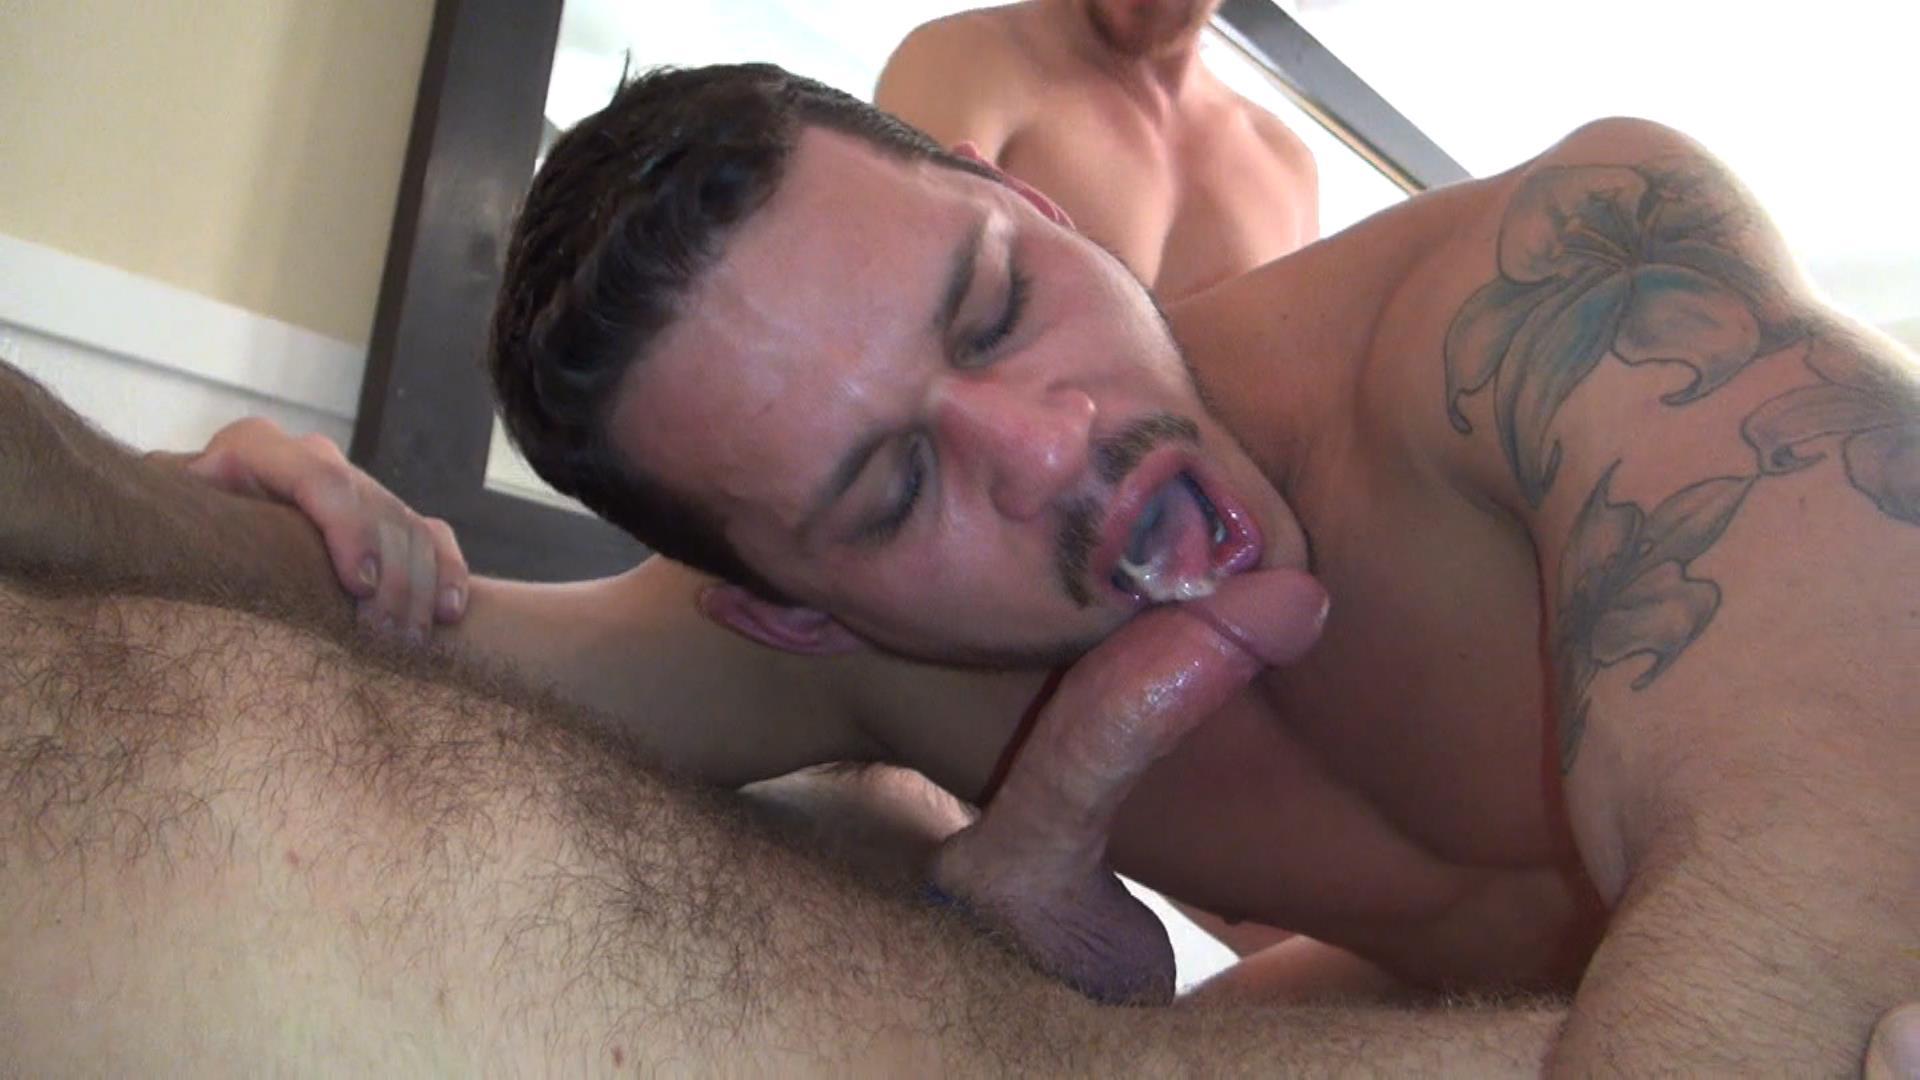 Raw-Fuck-Club-Dayton-OConnor-Tate-Ryder-Shay-Michaels-Adam-Russo-Bareback-Breeding-Amateur-Gay-Porn-8 Tate Ryder Gets Three Hairy Muscle Daddy Bareback Cocks